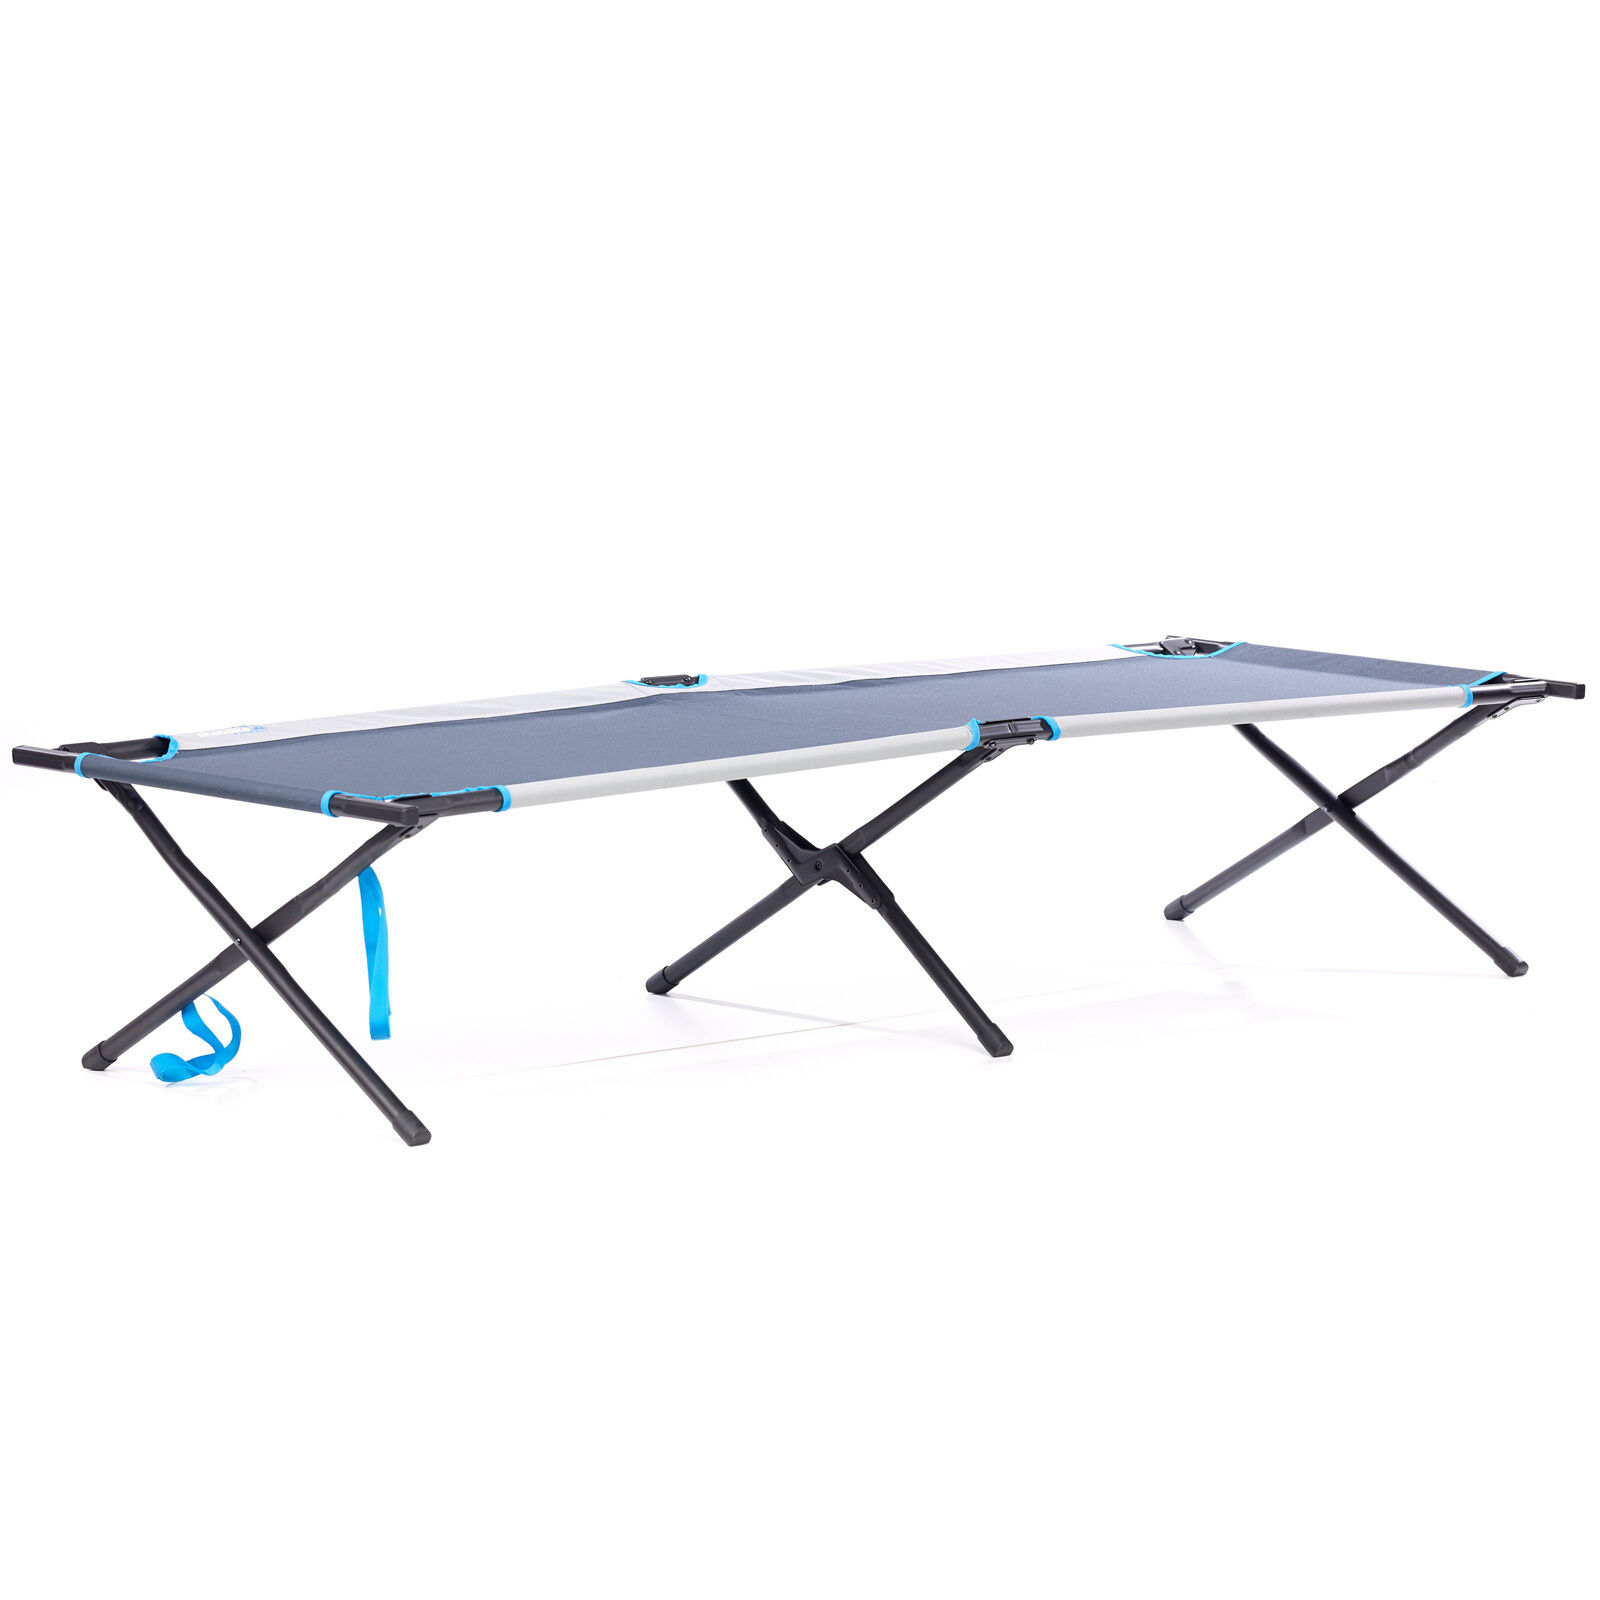 Skandika Feldbett XL Large Camping Bed Folding Portable Heavy Duty New